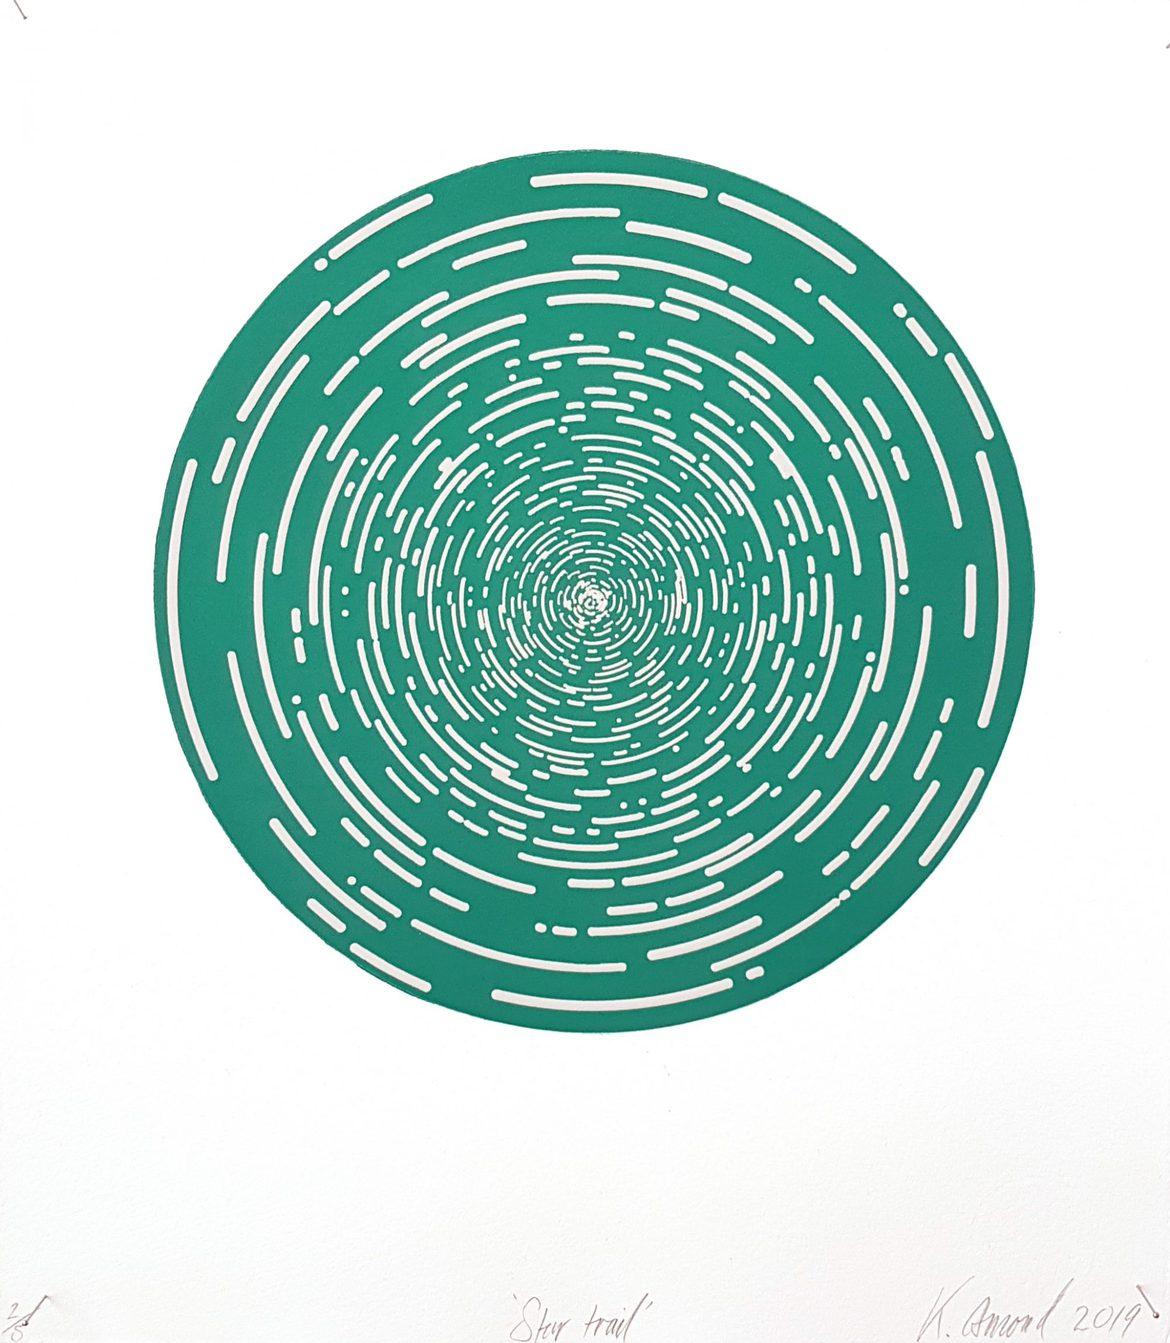 Star Trail (Dark Cyan), woodblock print, 300gsm hahnemühle deckled edge etching paper, edition of 5 +1AP, 35 x 31 cm